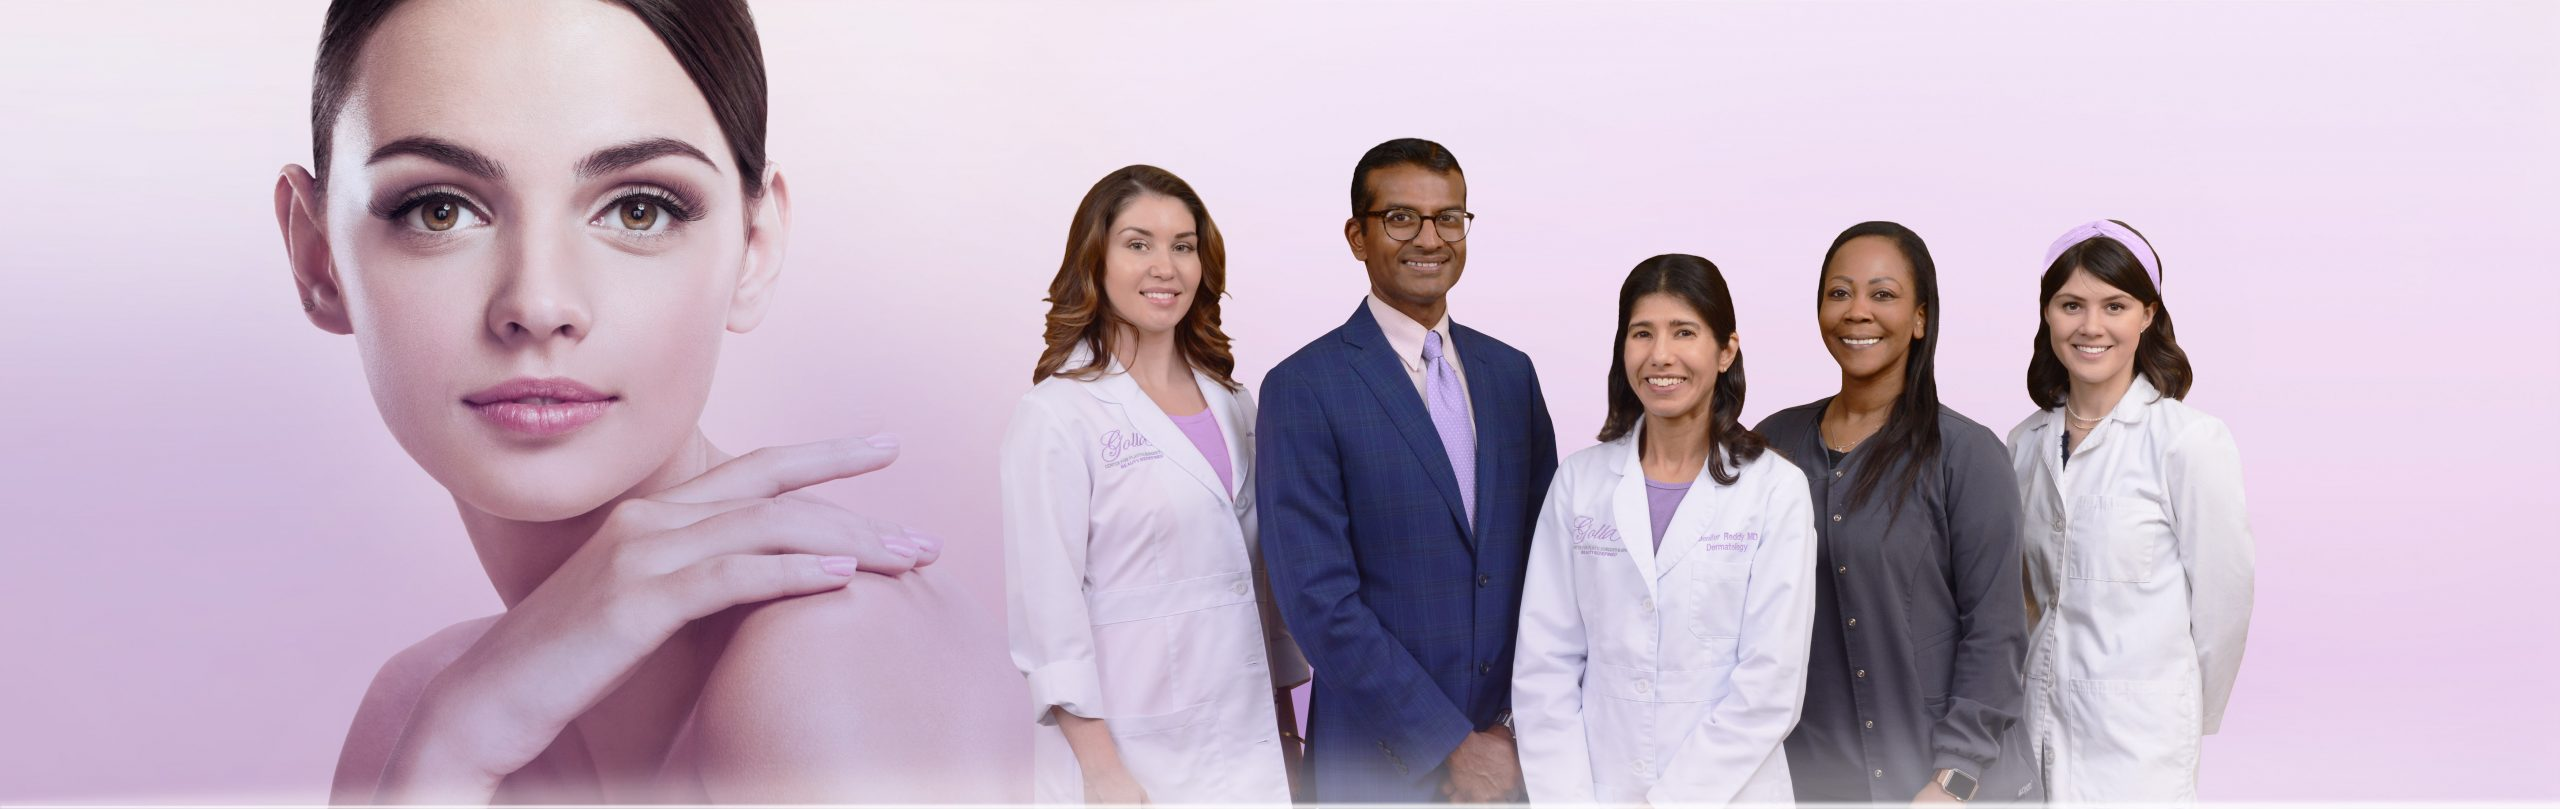 best dermatology clinics in Pittsburgh